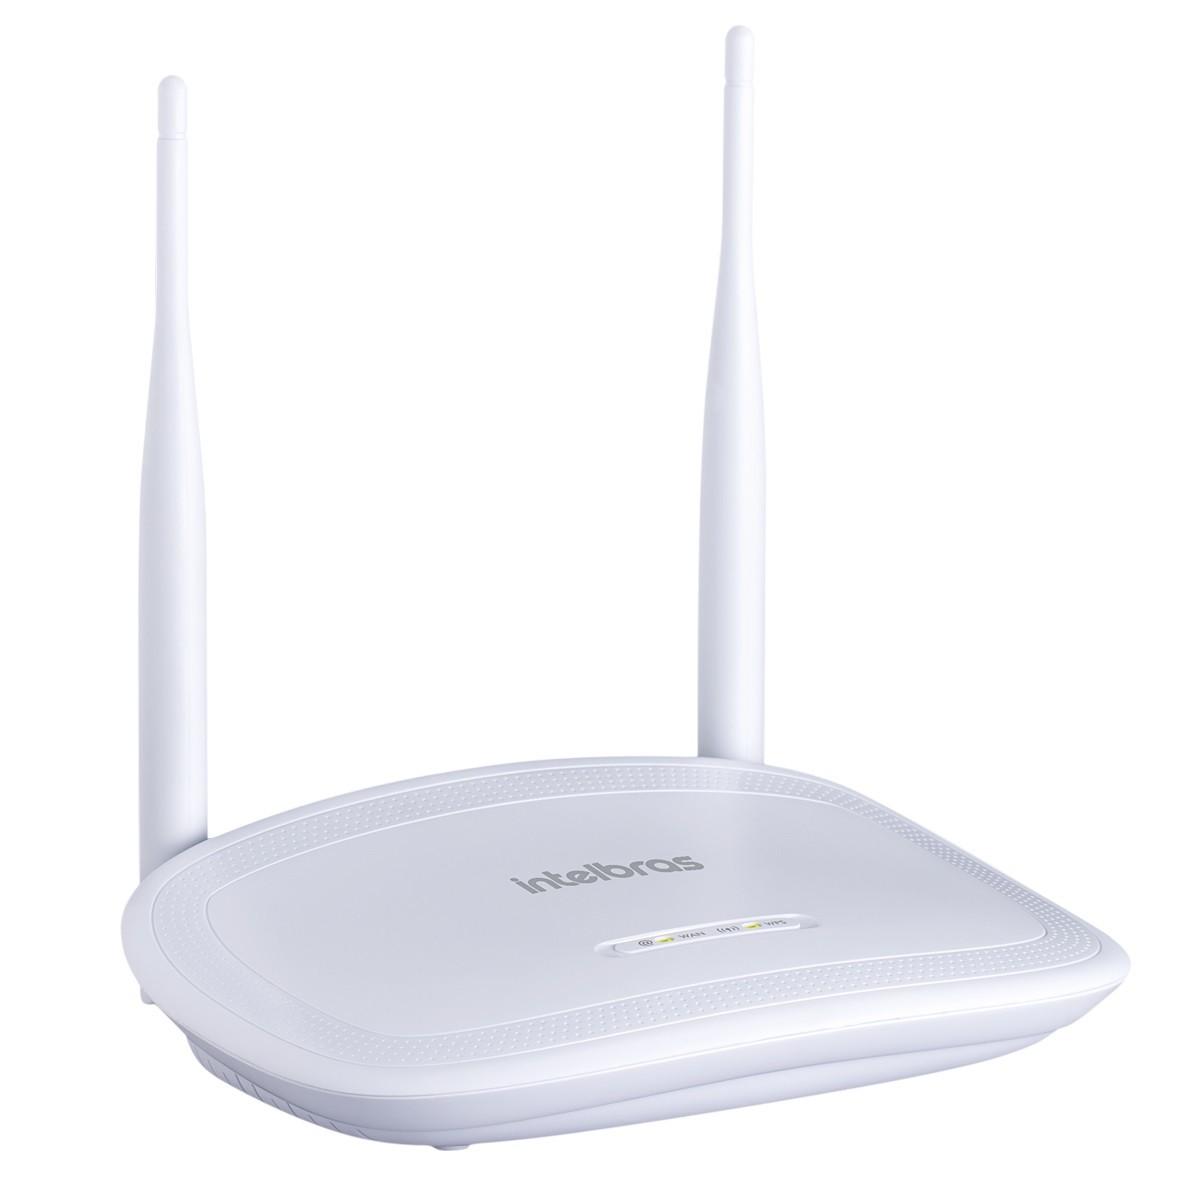 Roteador Wi-fi 300Mbps Intelbras - IWR3000N